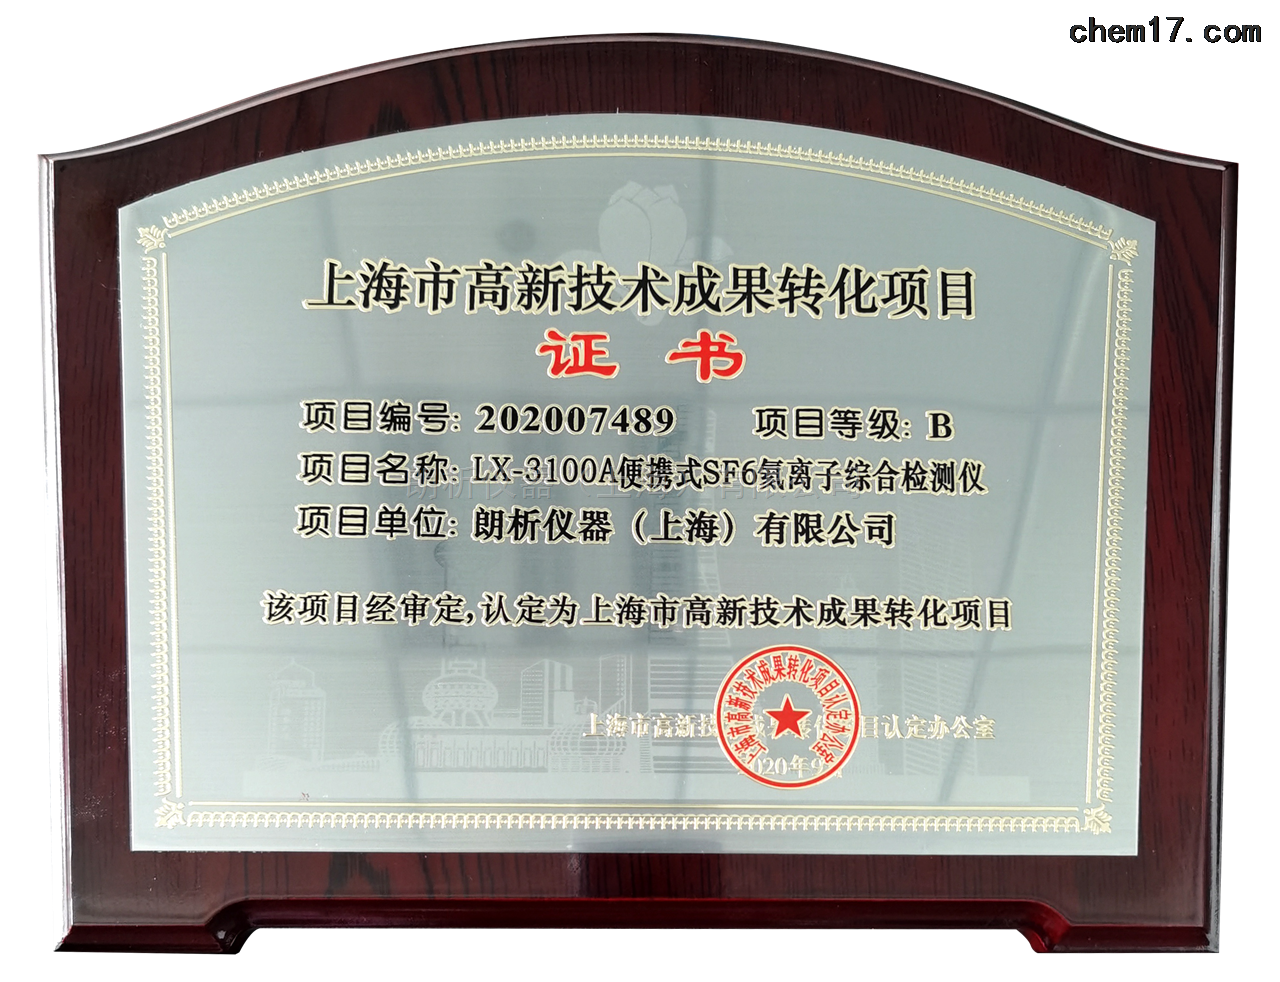 LX-3100A便攜式SF6氦離子綜合檢測儀成果轉化證書